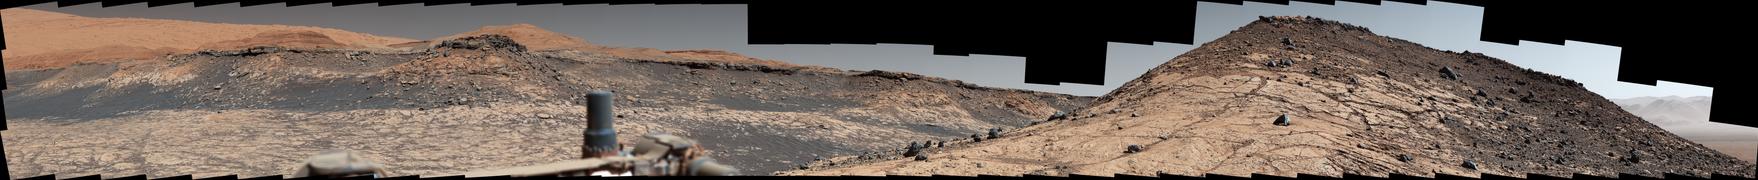 PIA23971-MarsCuriosityRover-Landscape-20200803.png